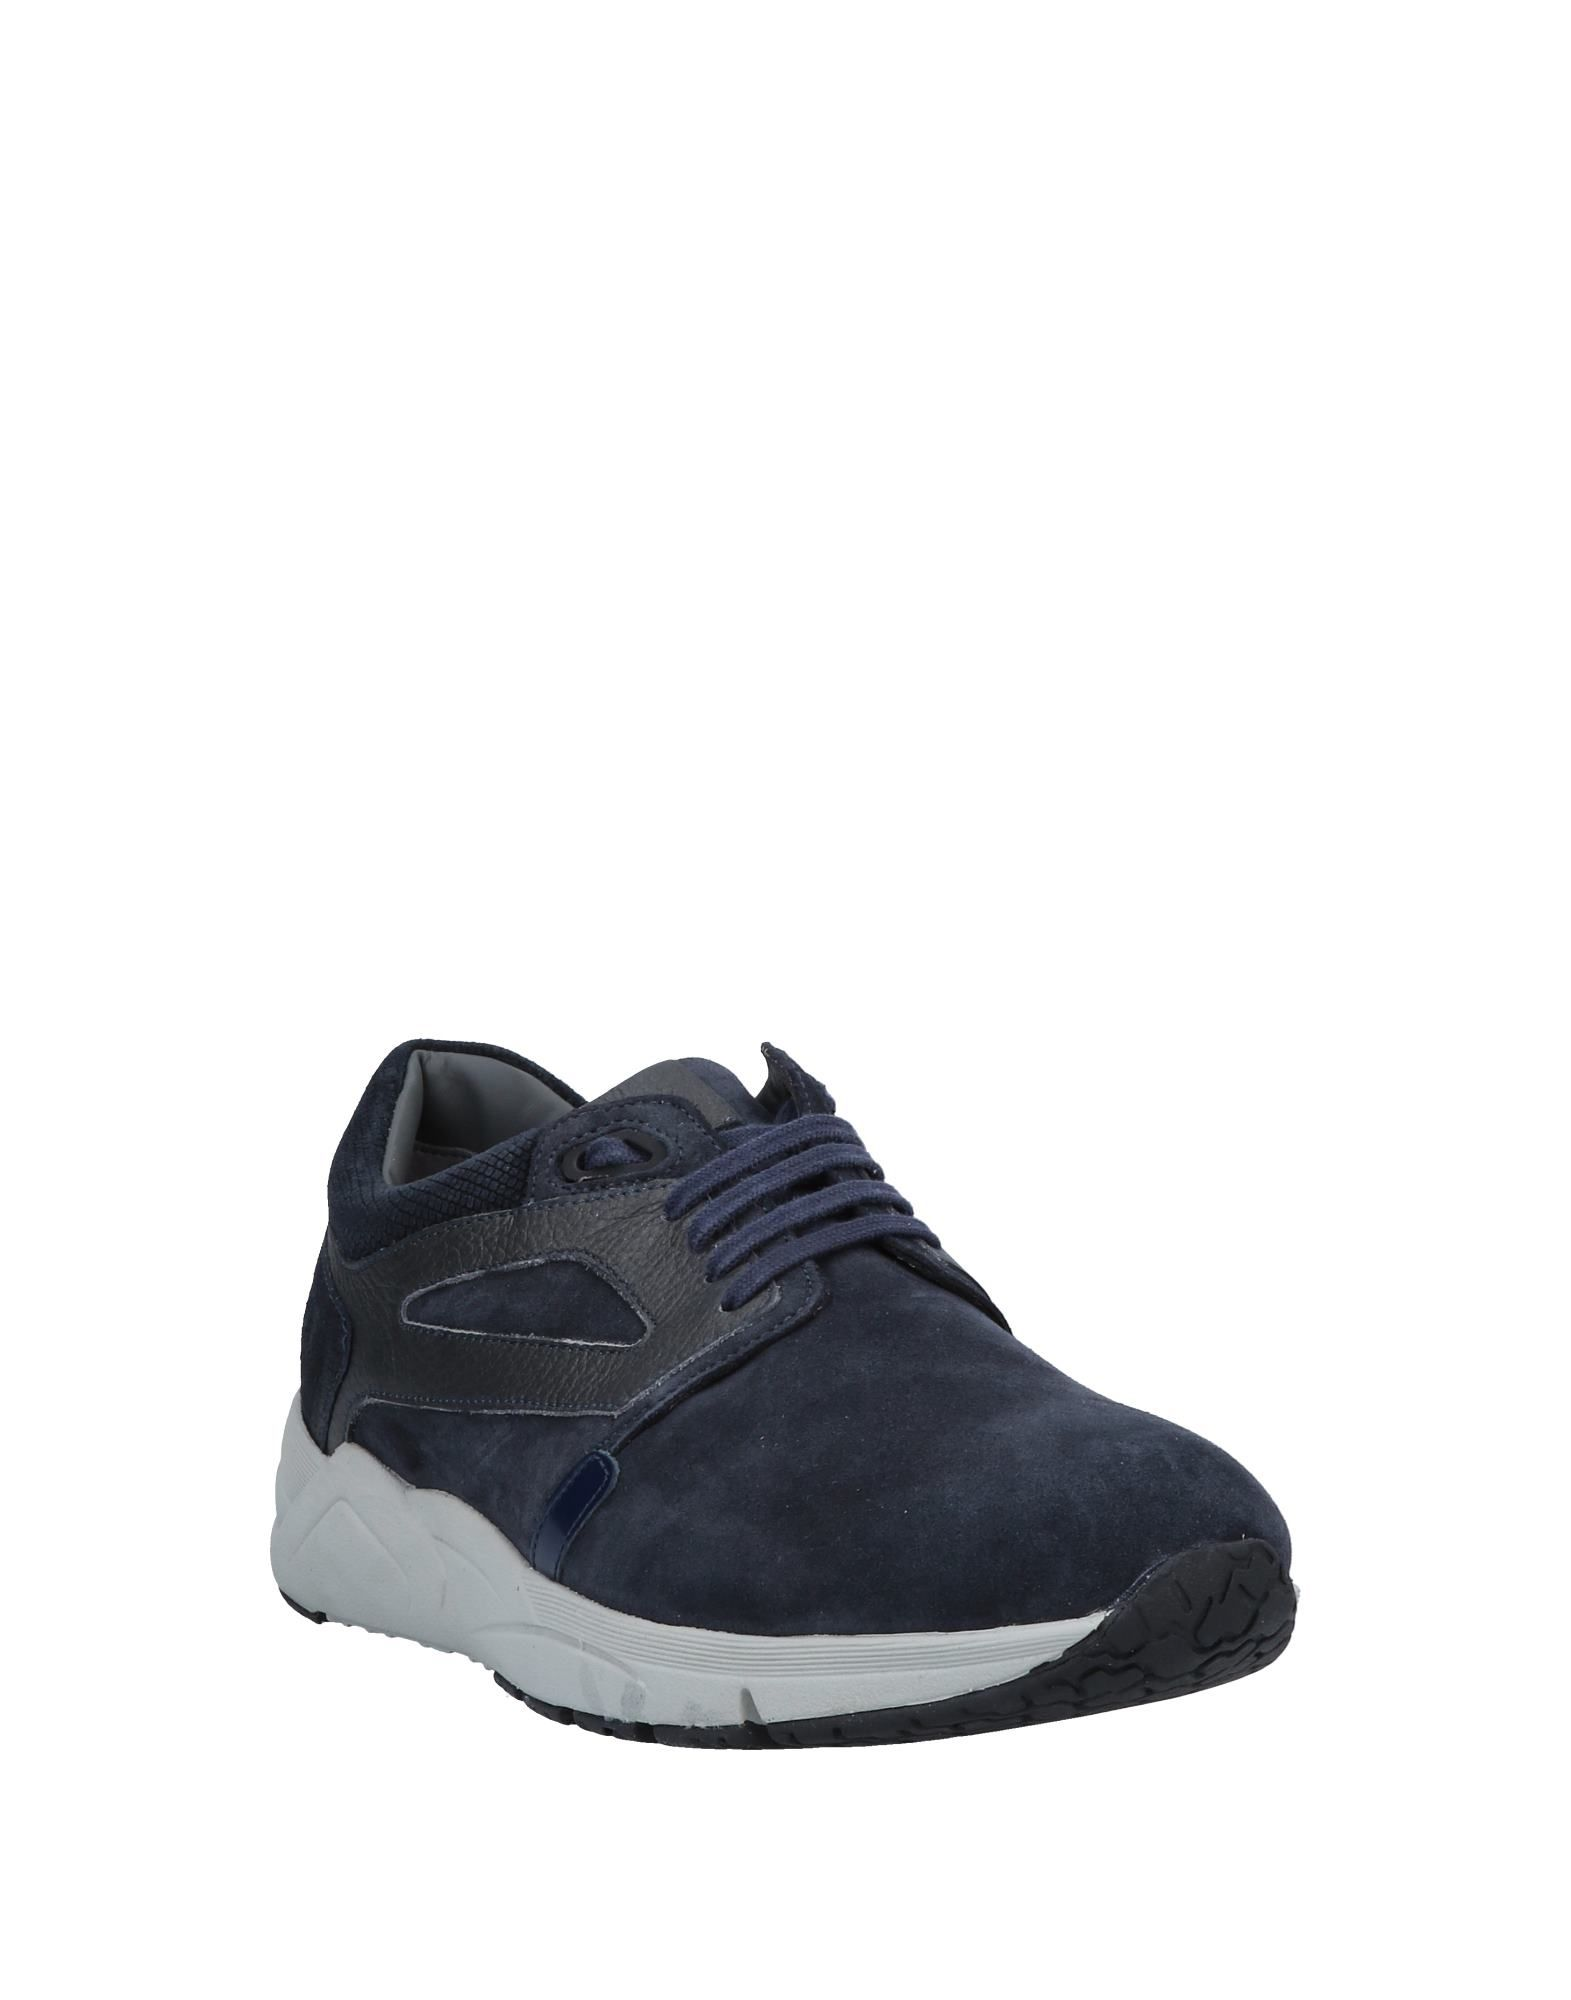 Alberto Guardiani Sneakers Sneakers Sneakers - Men Alberto Guardiani Sneakers online on  Canada - 11568045VX bf0cba